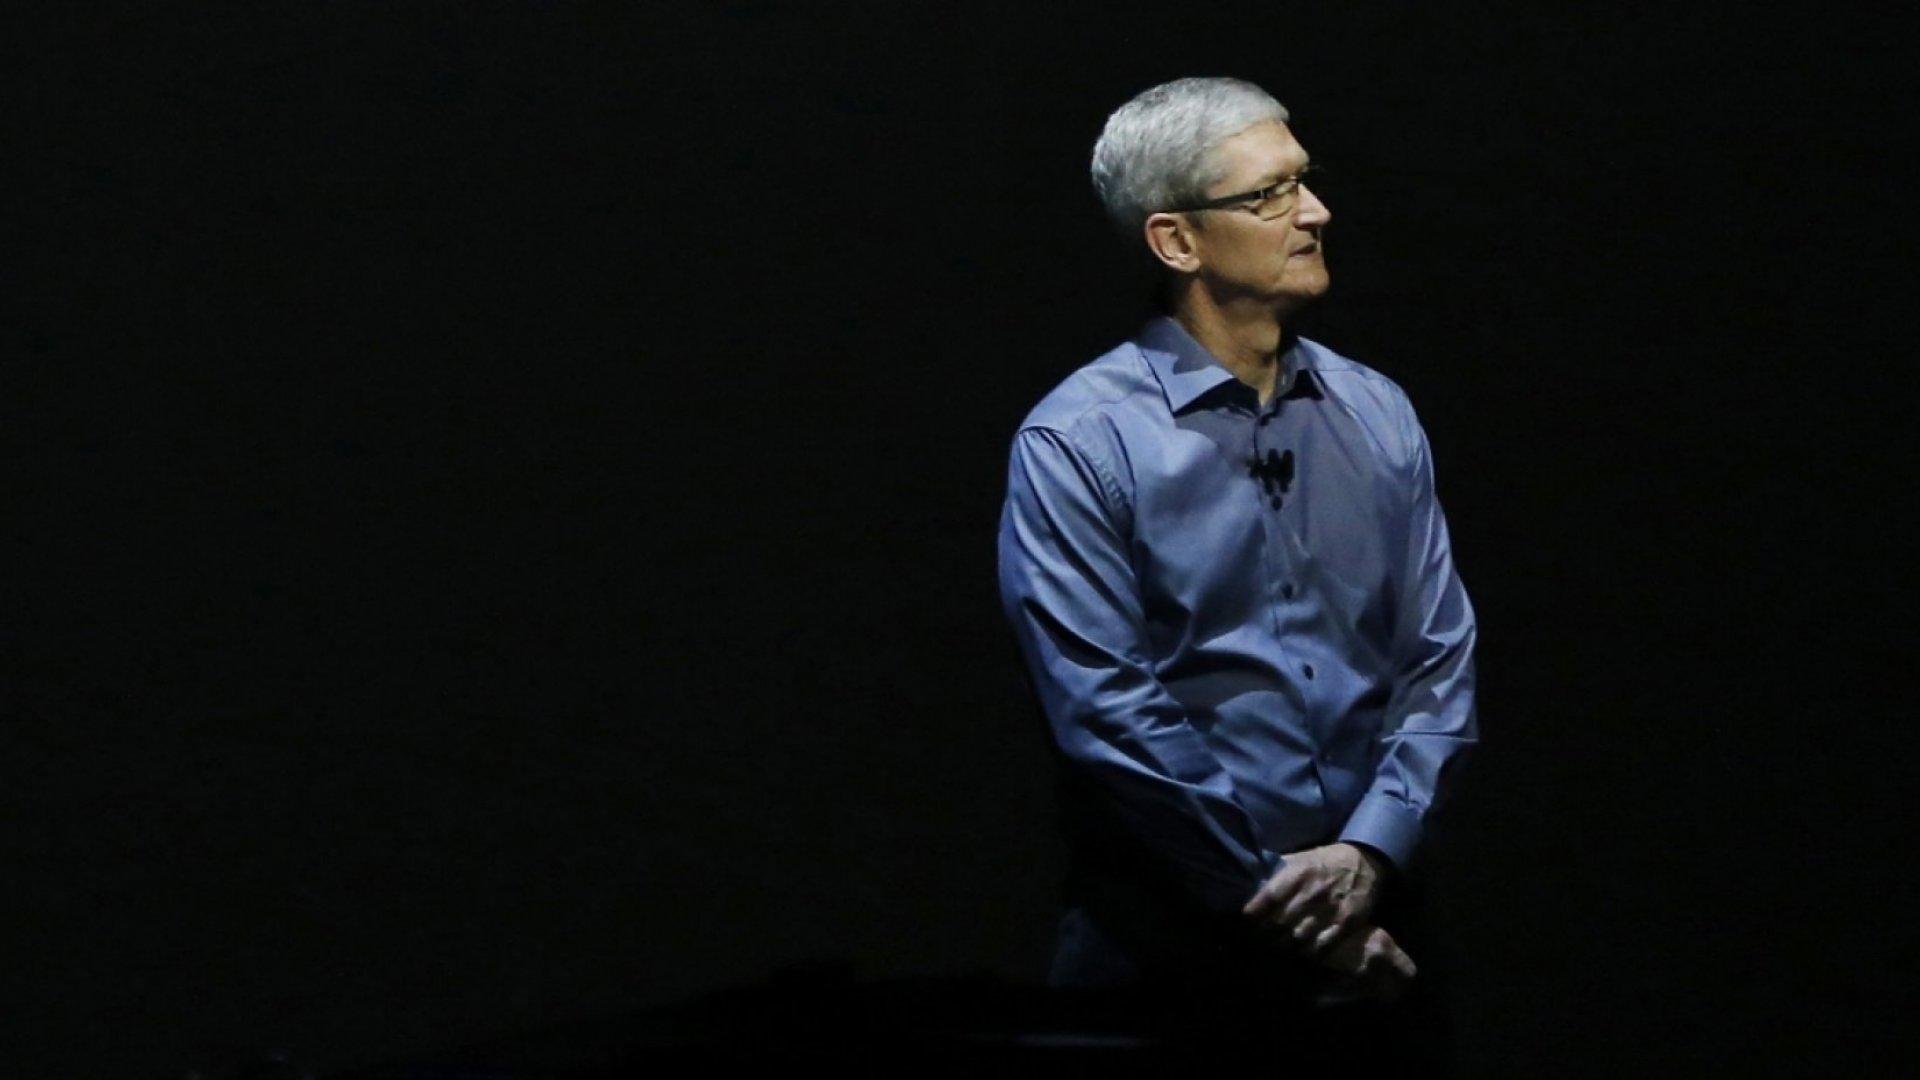 Apple Announces $1 Billion Fund to Boost U.S. Manufacturing Jobs